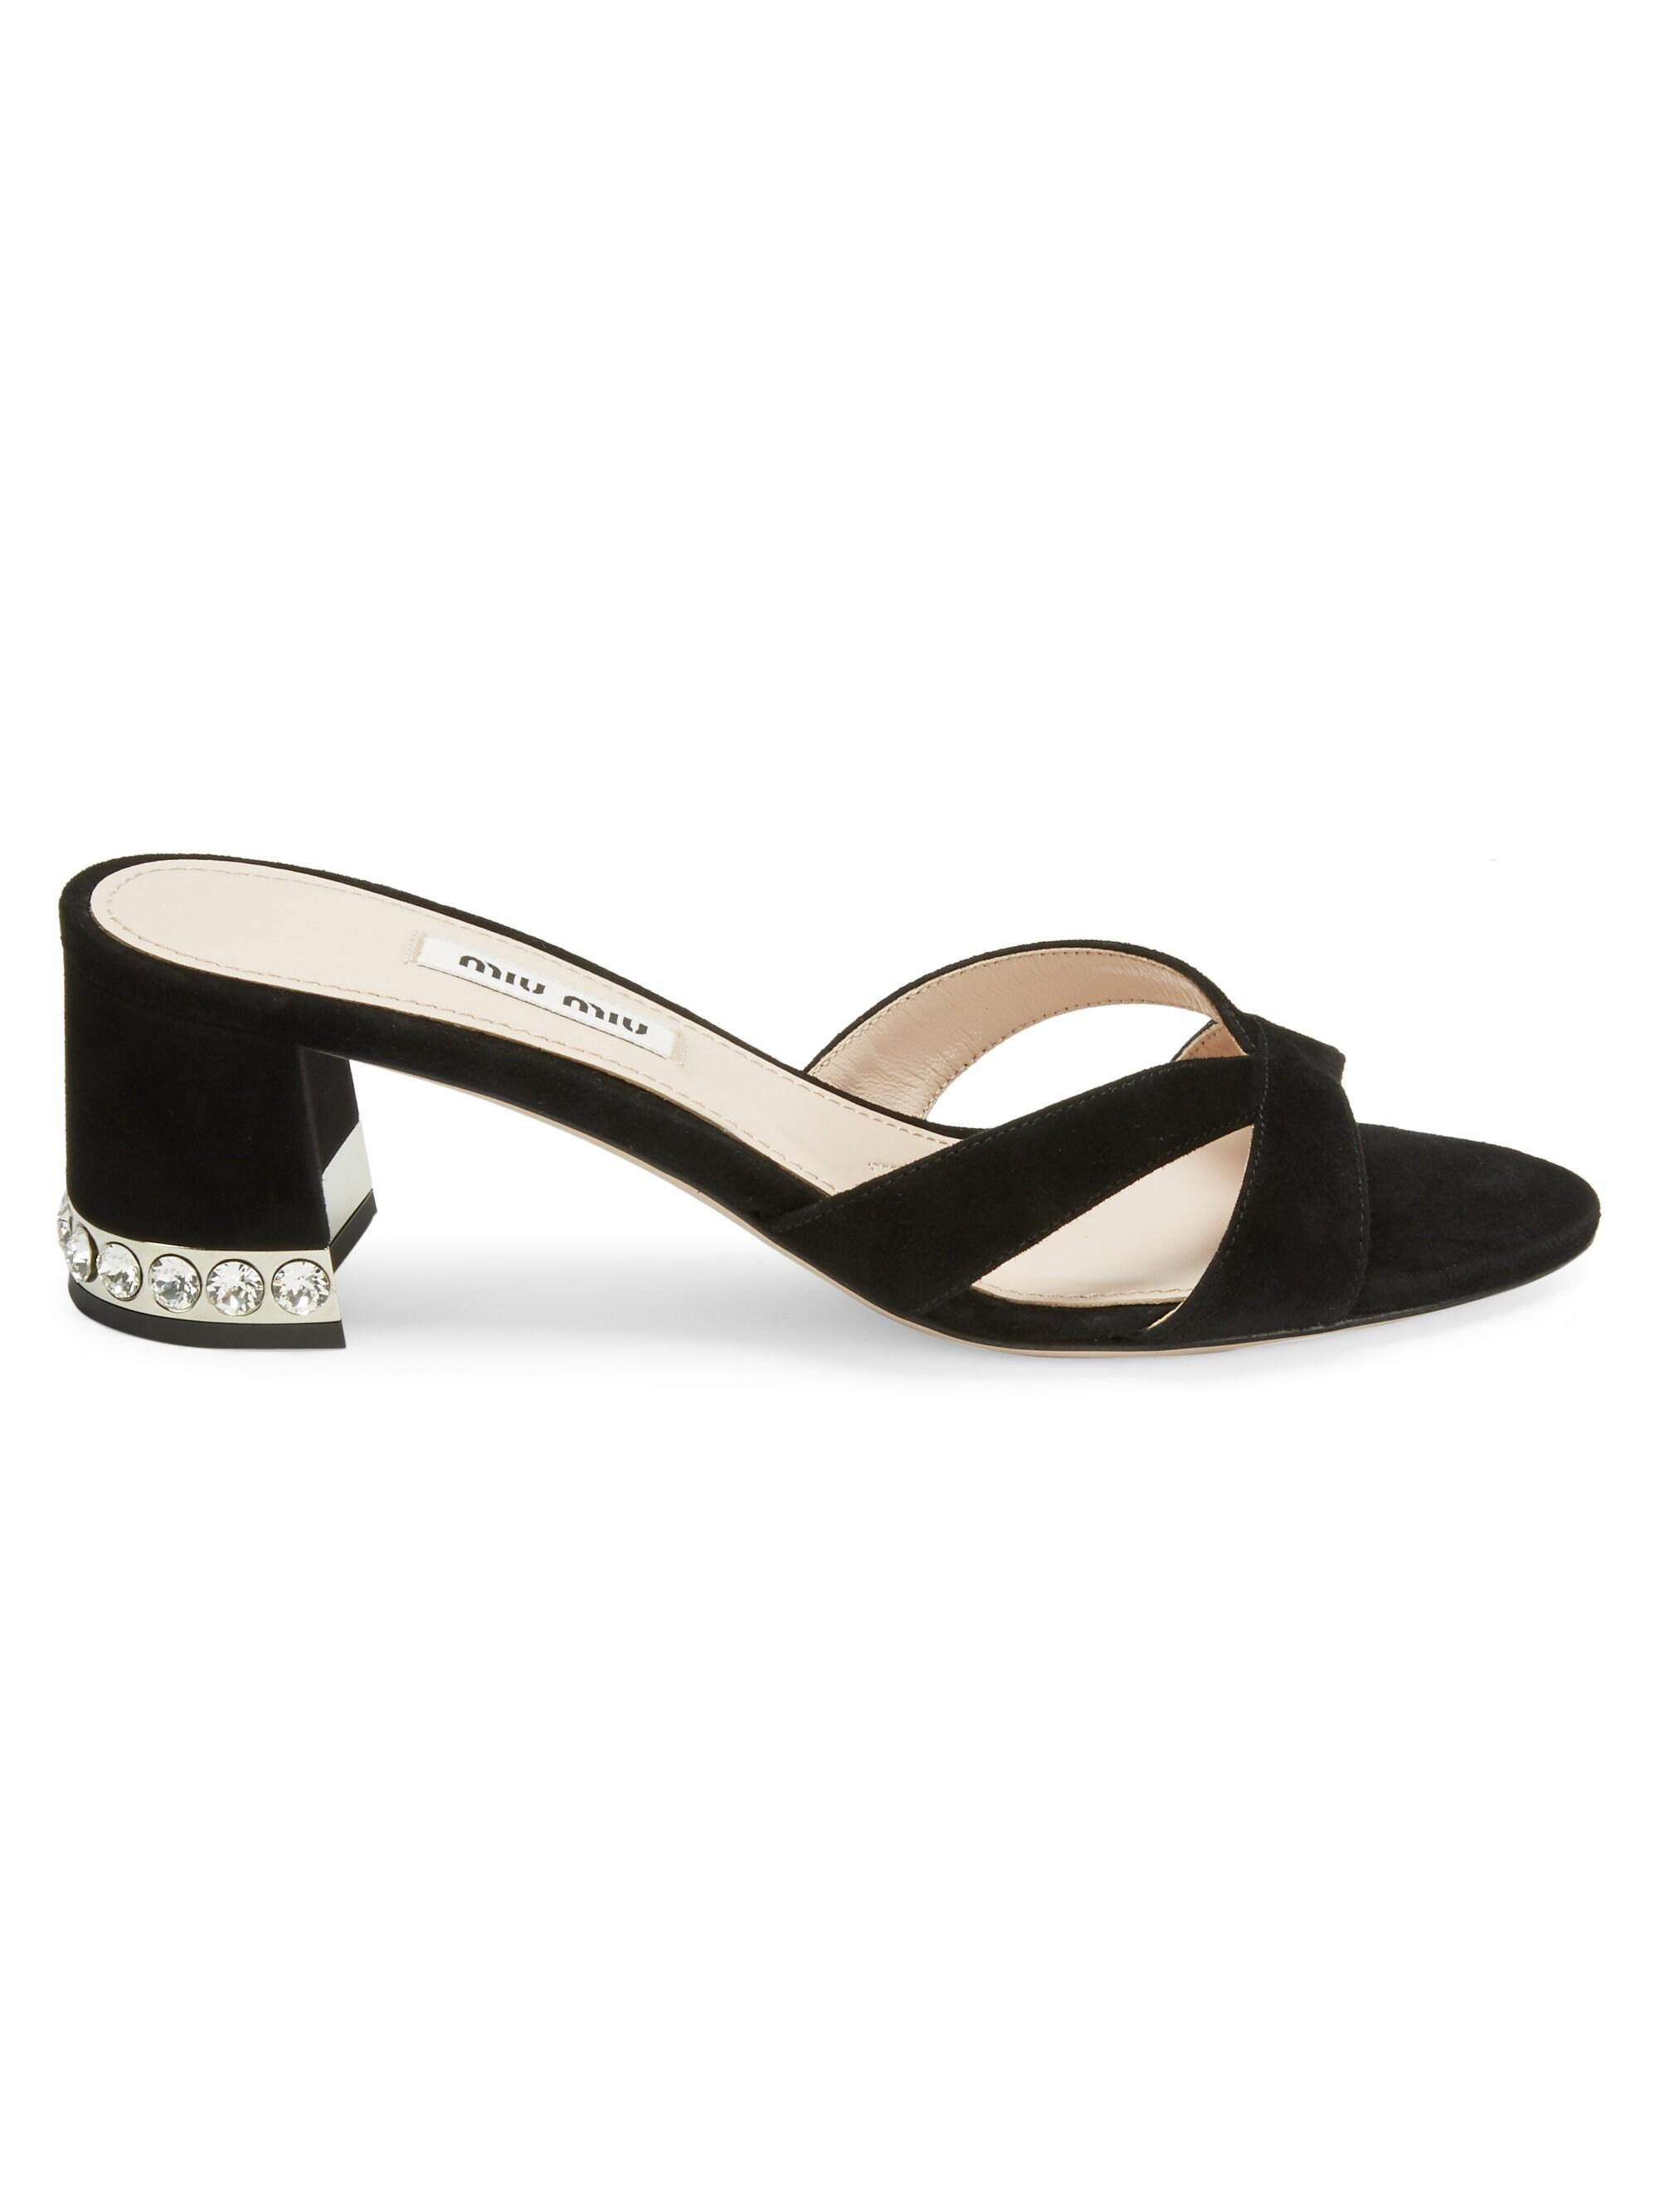 b837622bee Miu Miu Women's Crystal Block Heel Sandals - Black in Black - Lyst